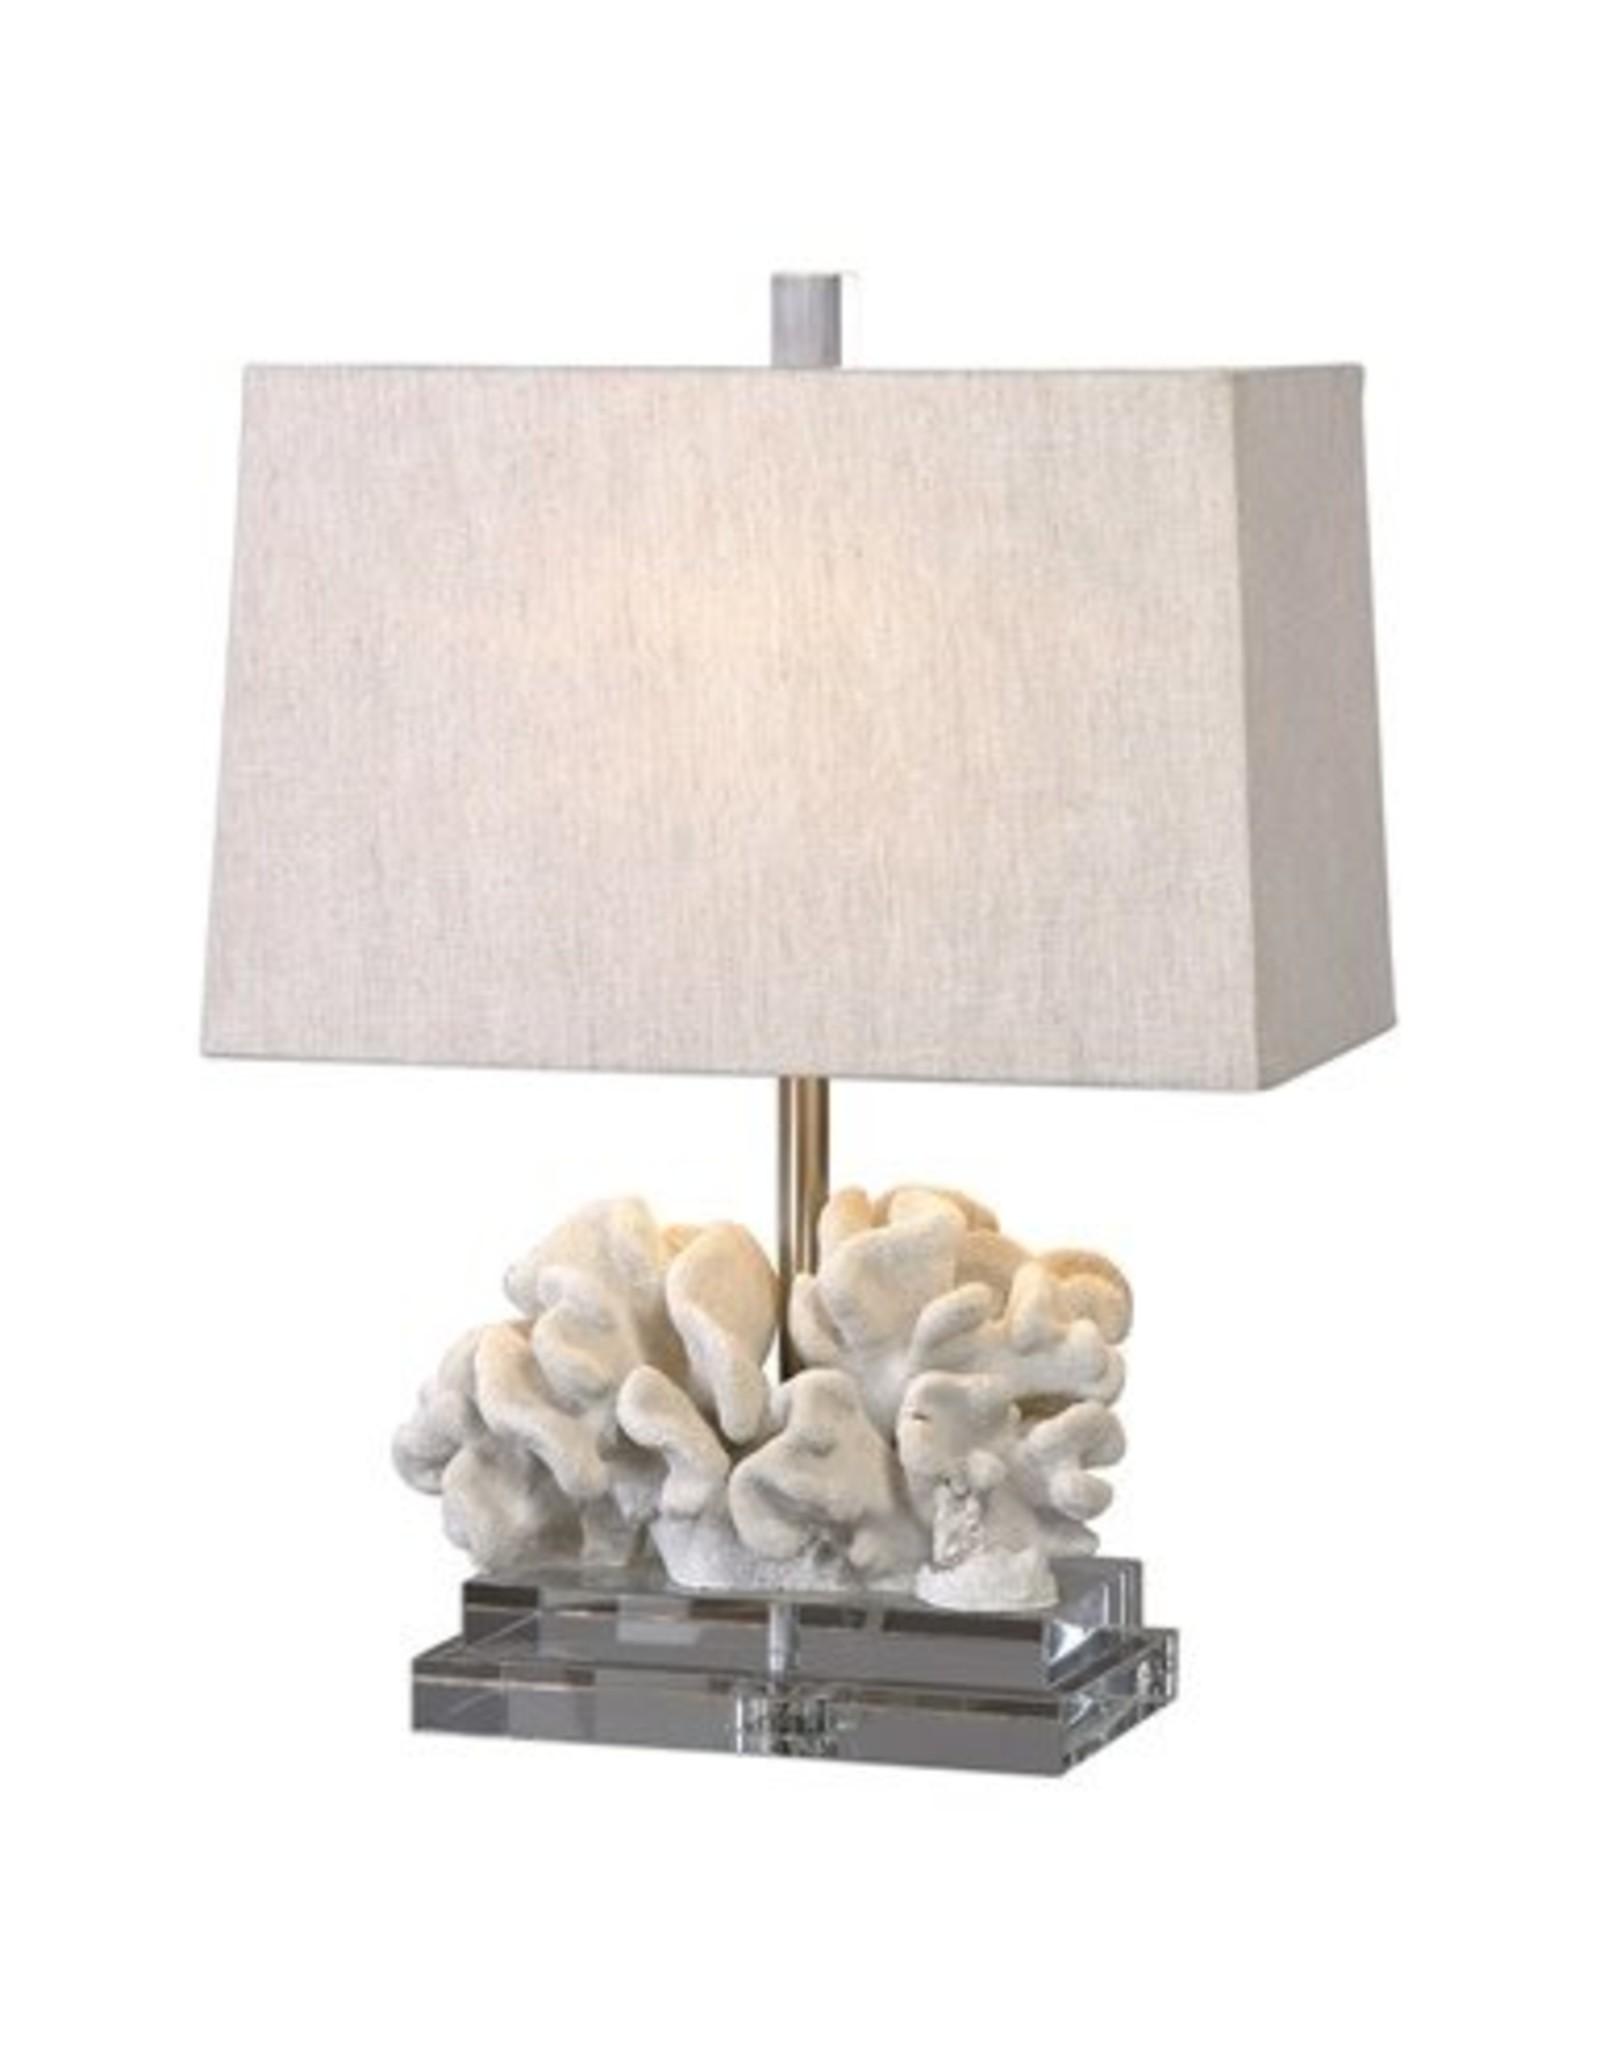 Website Coral Sculpture Table Lamp